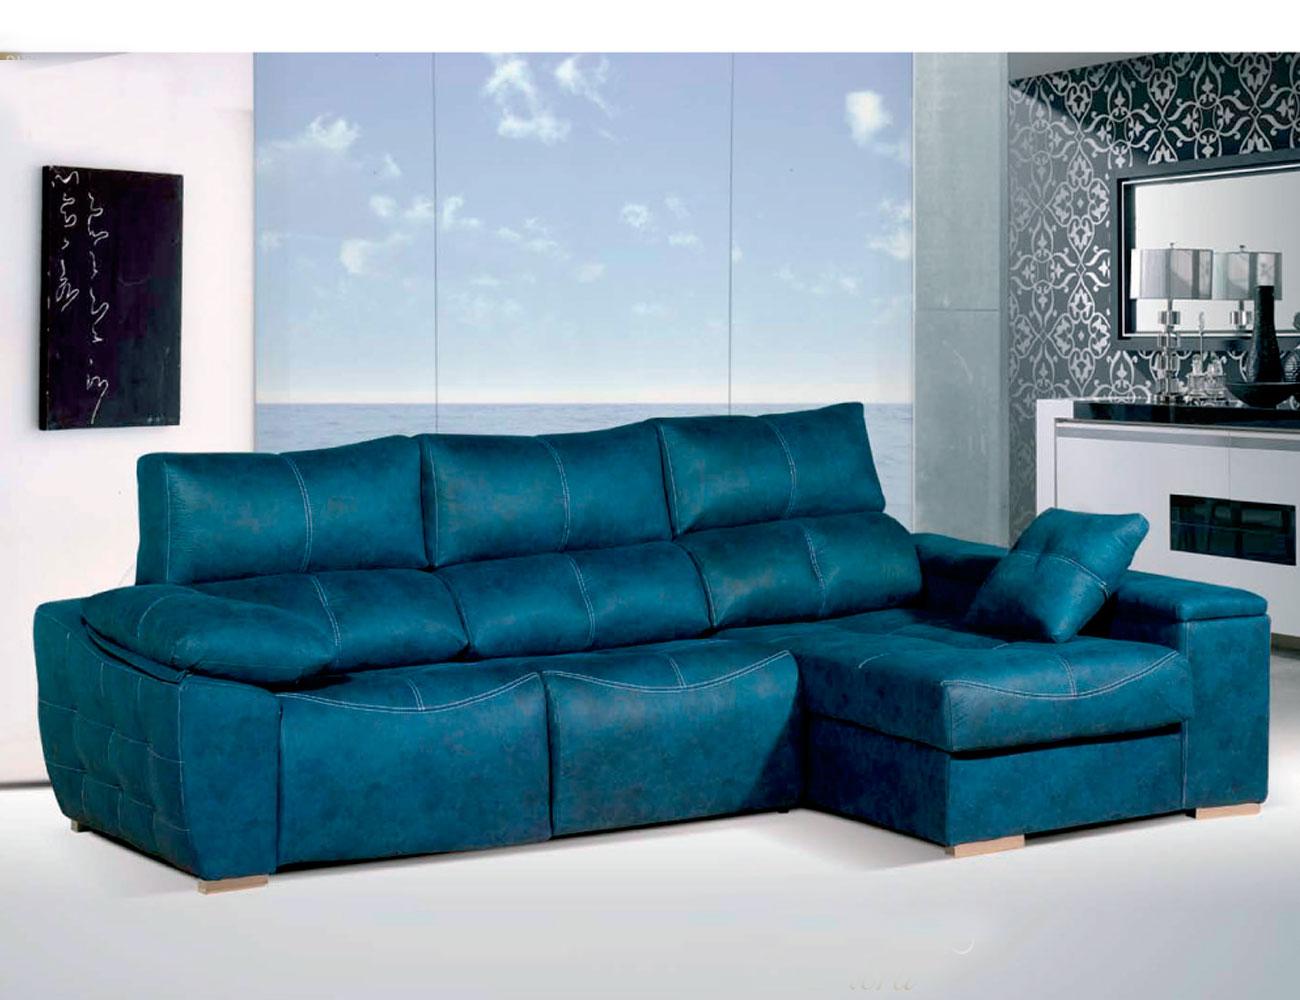 Sofa chaiselongue relax 2 motores anti manchas turquesa26